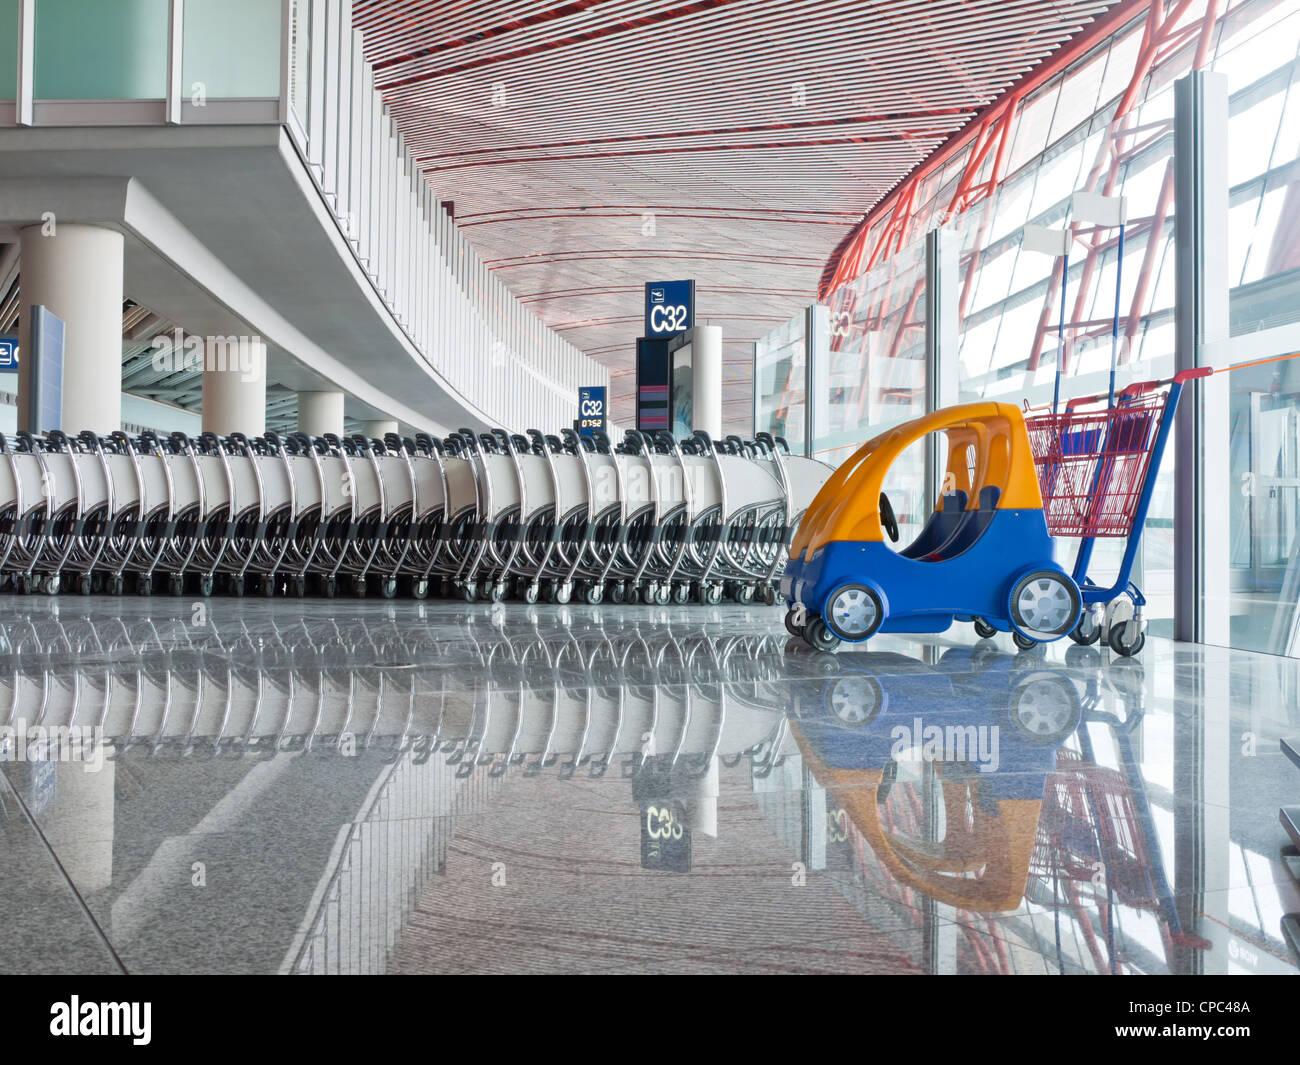 Push cart at the airport - Stock Image